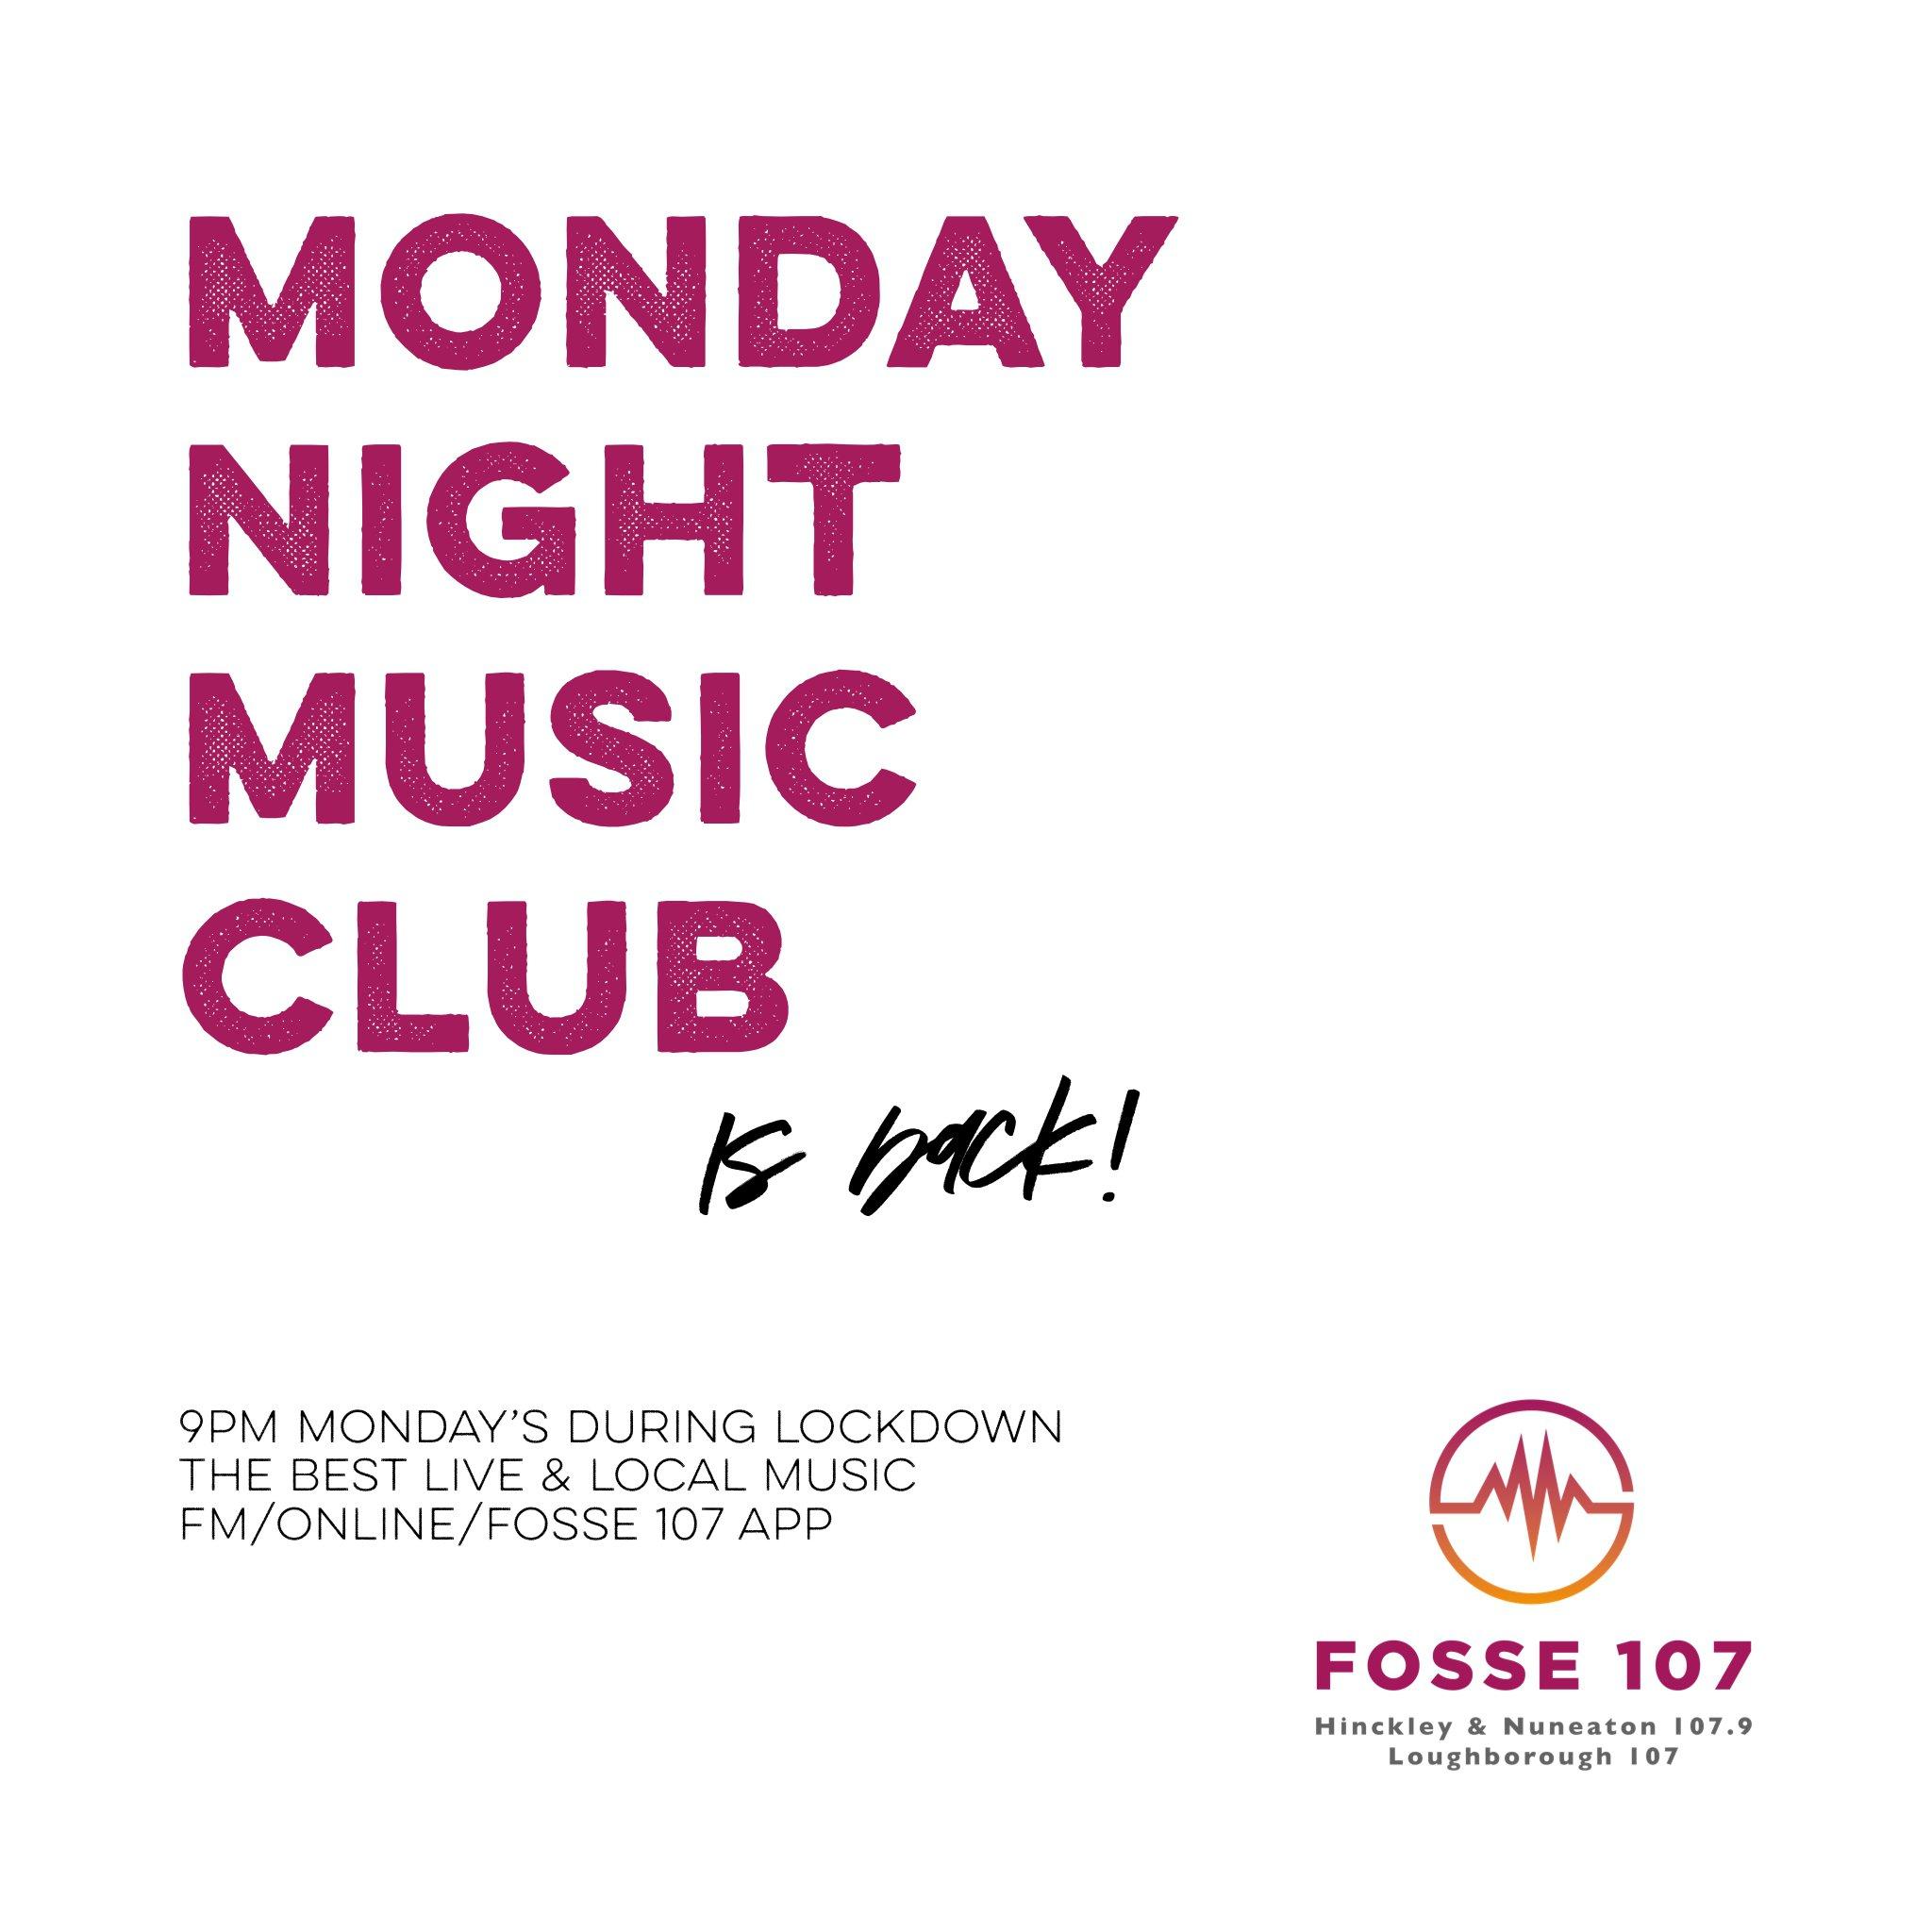 Monday Night Music Club with Richie Phillips